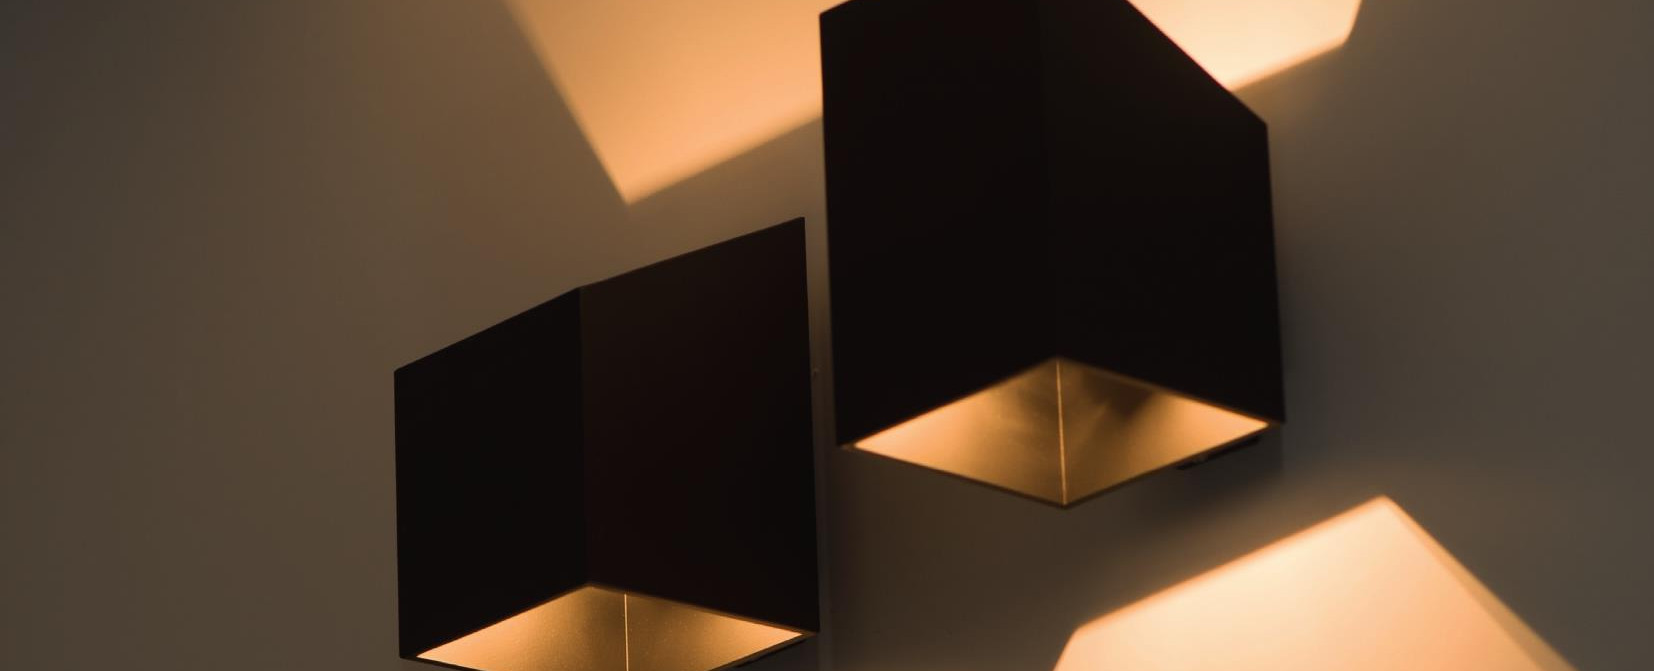 Lampy Nad Lustroobraz Lampex